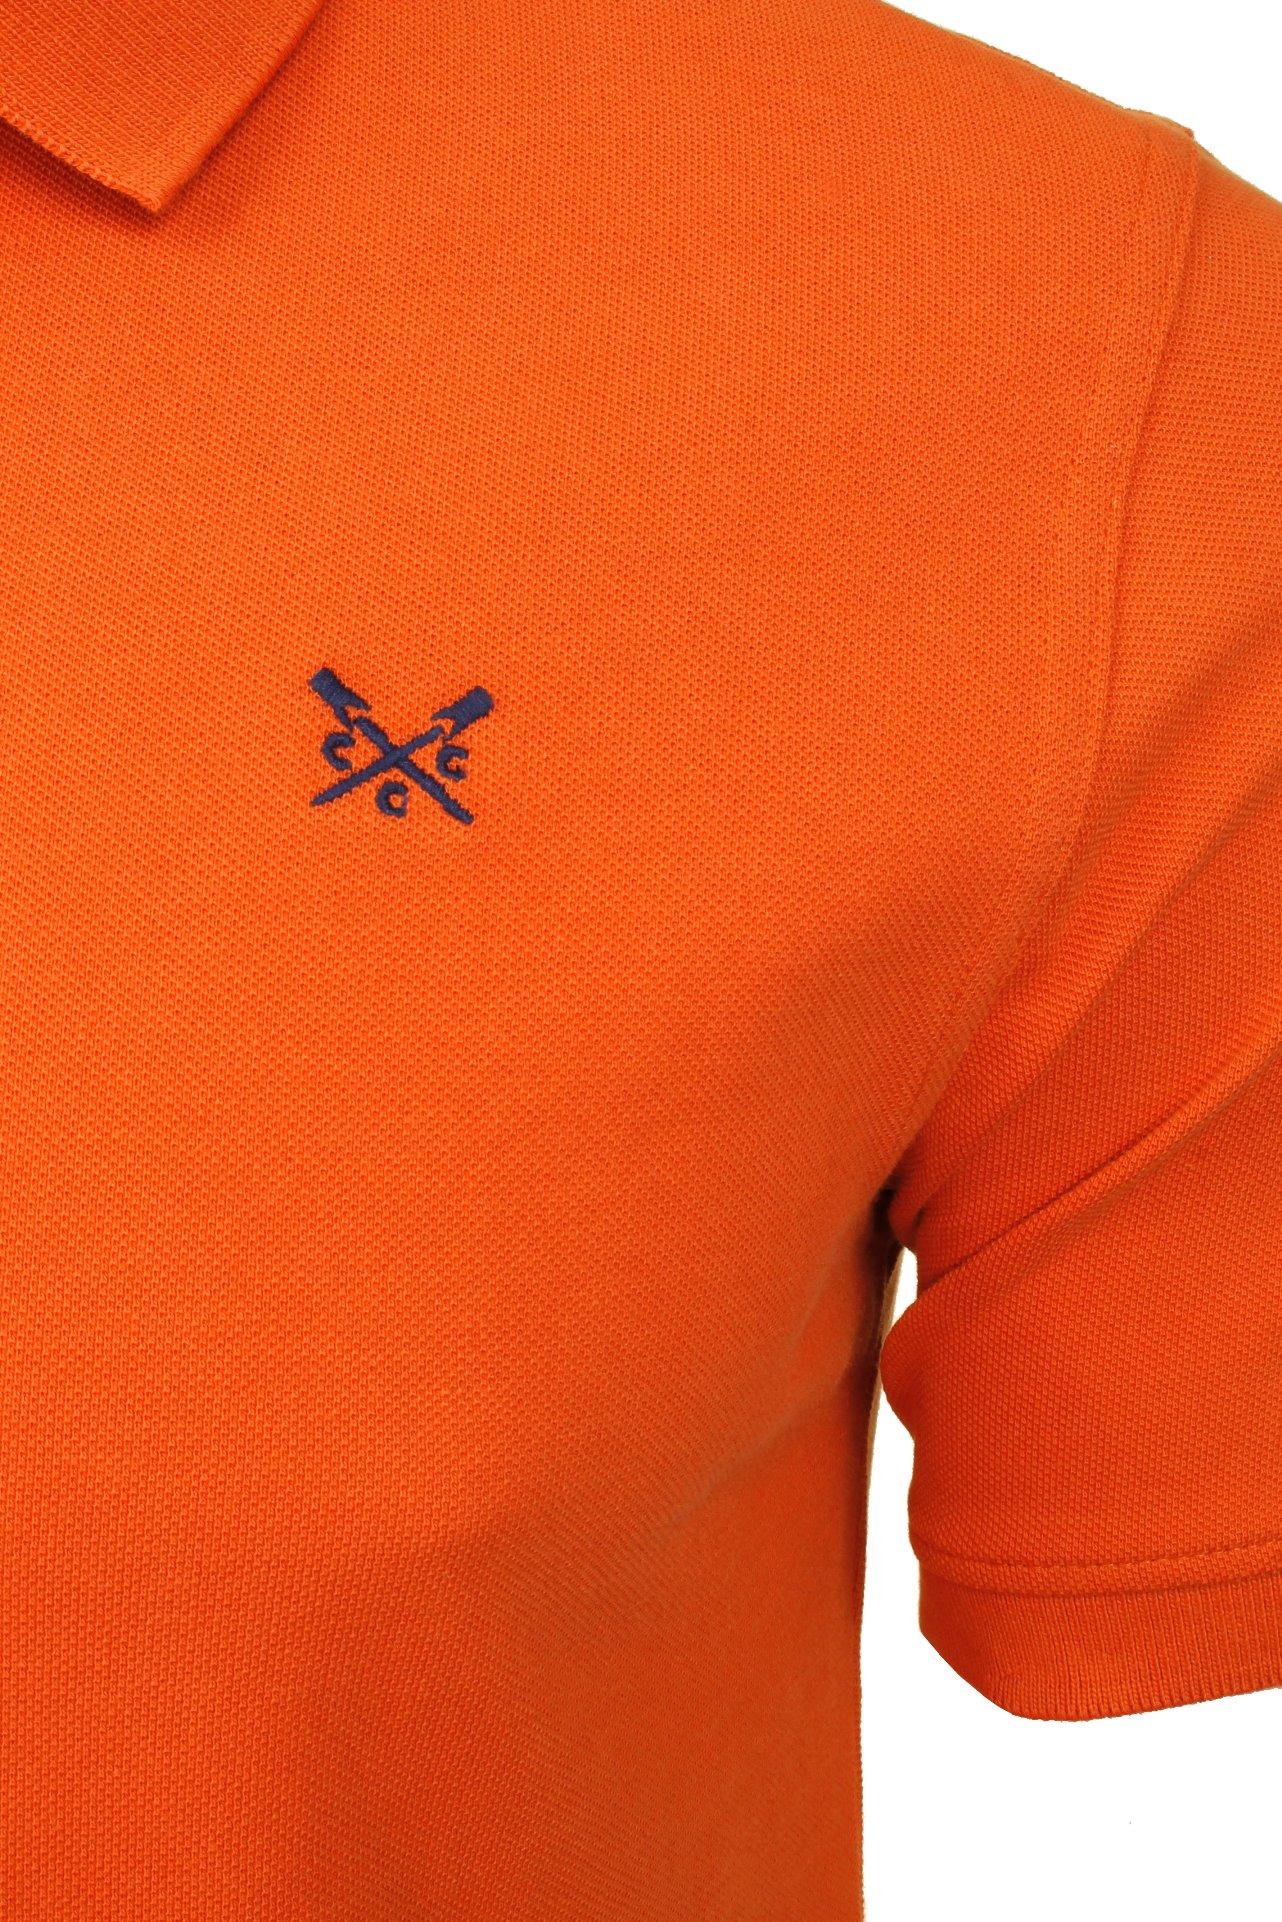 Short Sleeved Crew Clothing Mens Pique Polo Shirt /'Classic Pique Polo/'